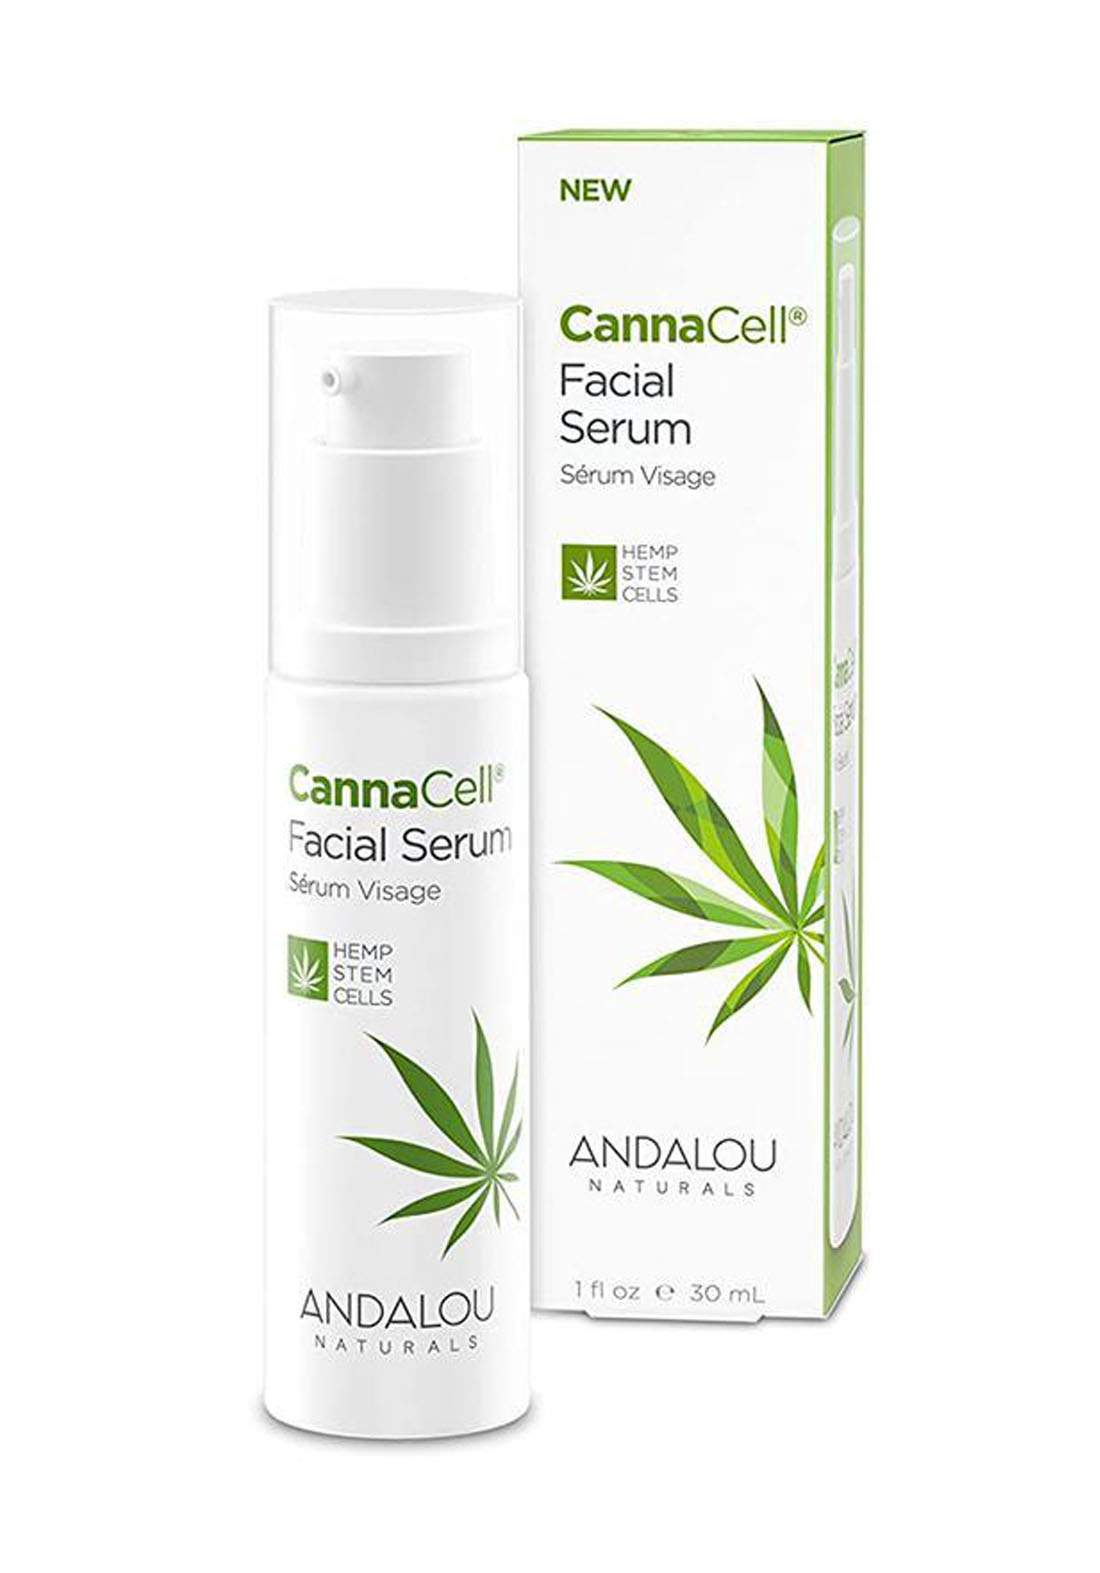 Andalou 7156 Cana Cell Face Serum 30 ml سيروم للبشرة